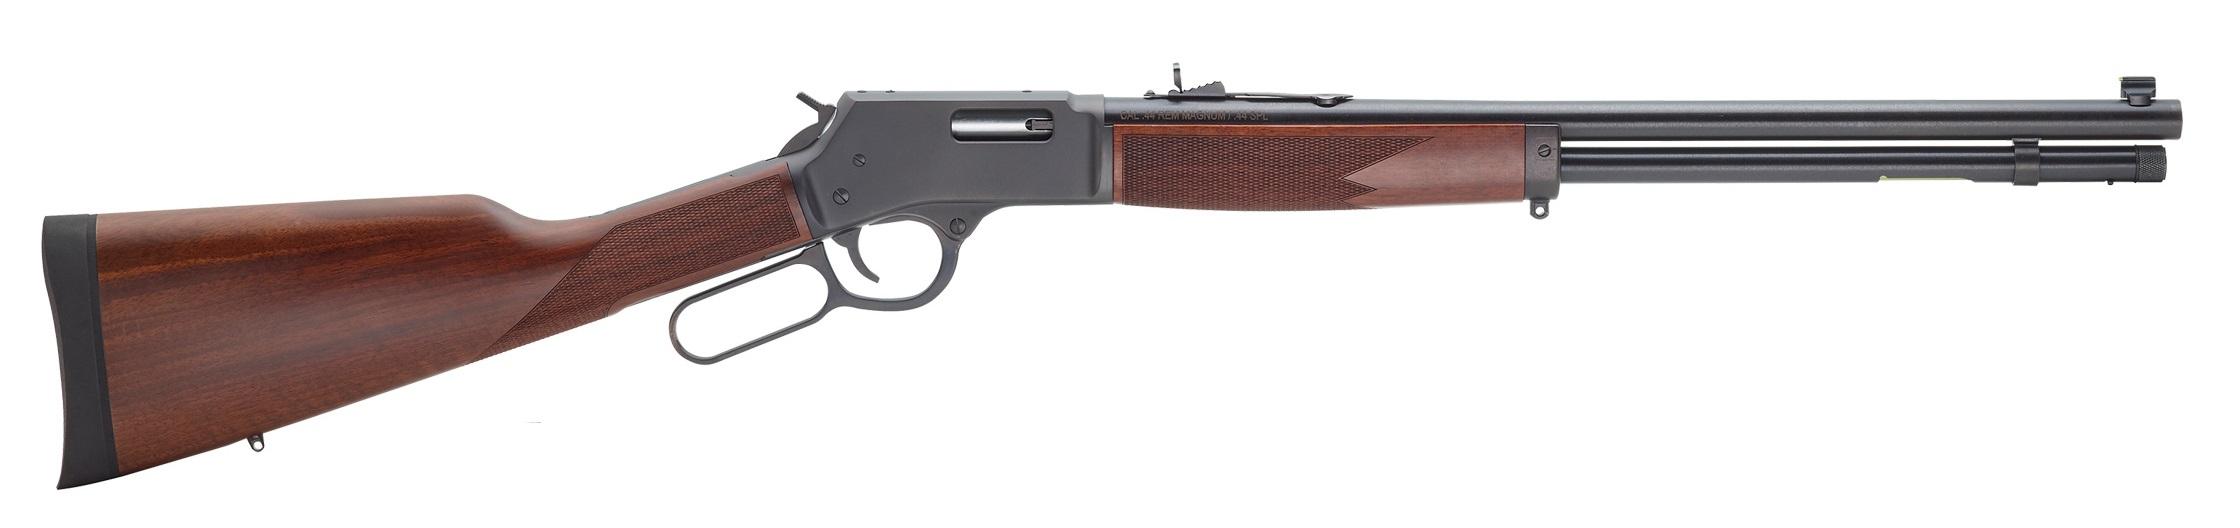 Opakovací puška Henry Big Boy Steel r. .357 Mag./ .45 LC / .44 Rem. Mag.